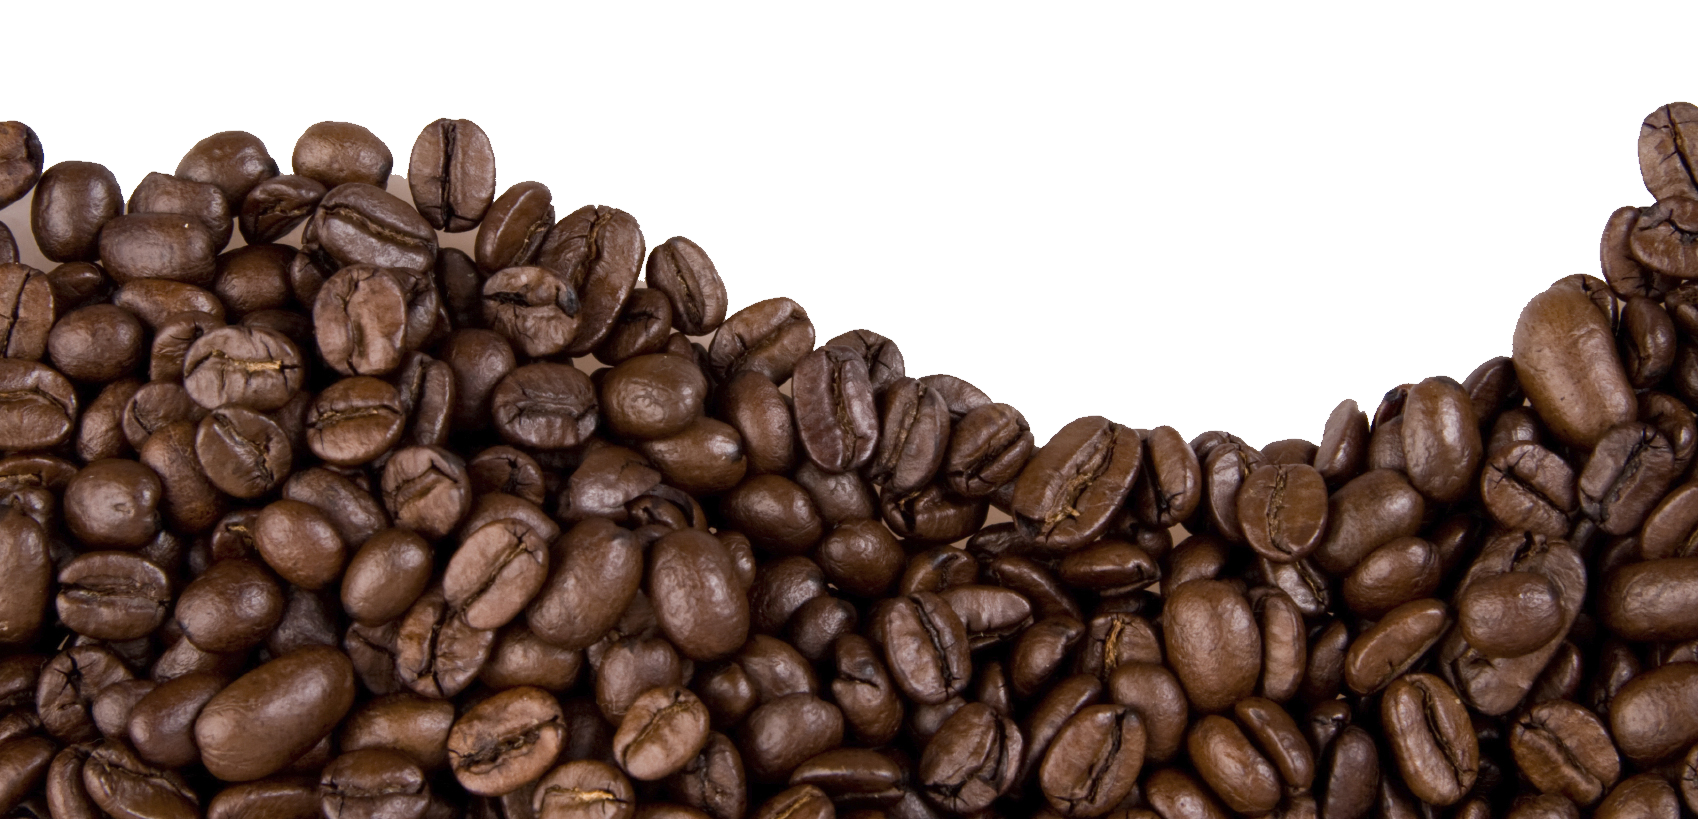 Jamaican Blue Mountain Coffee Cafe Coffee bean.